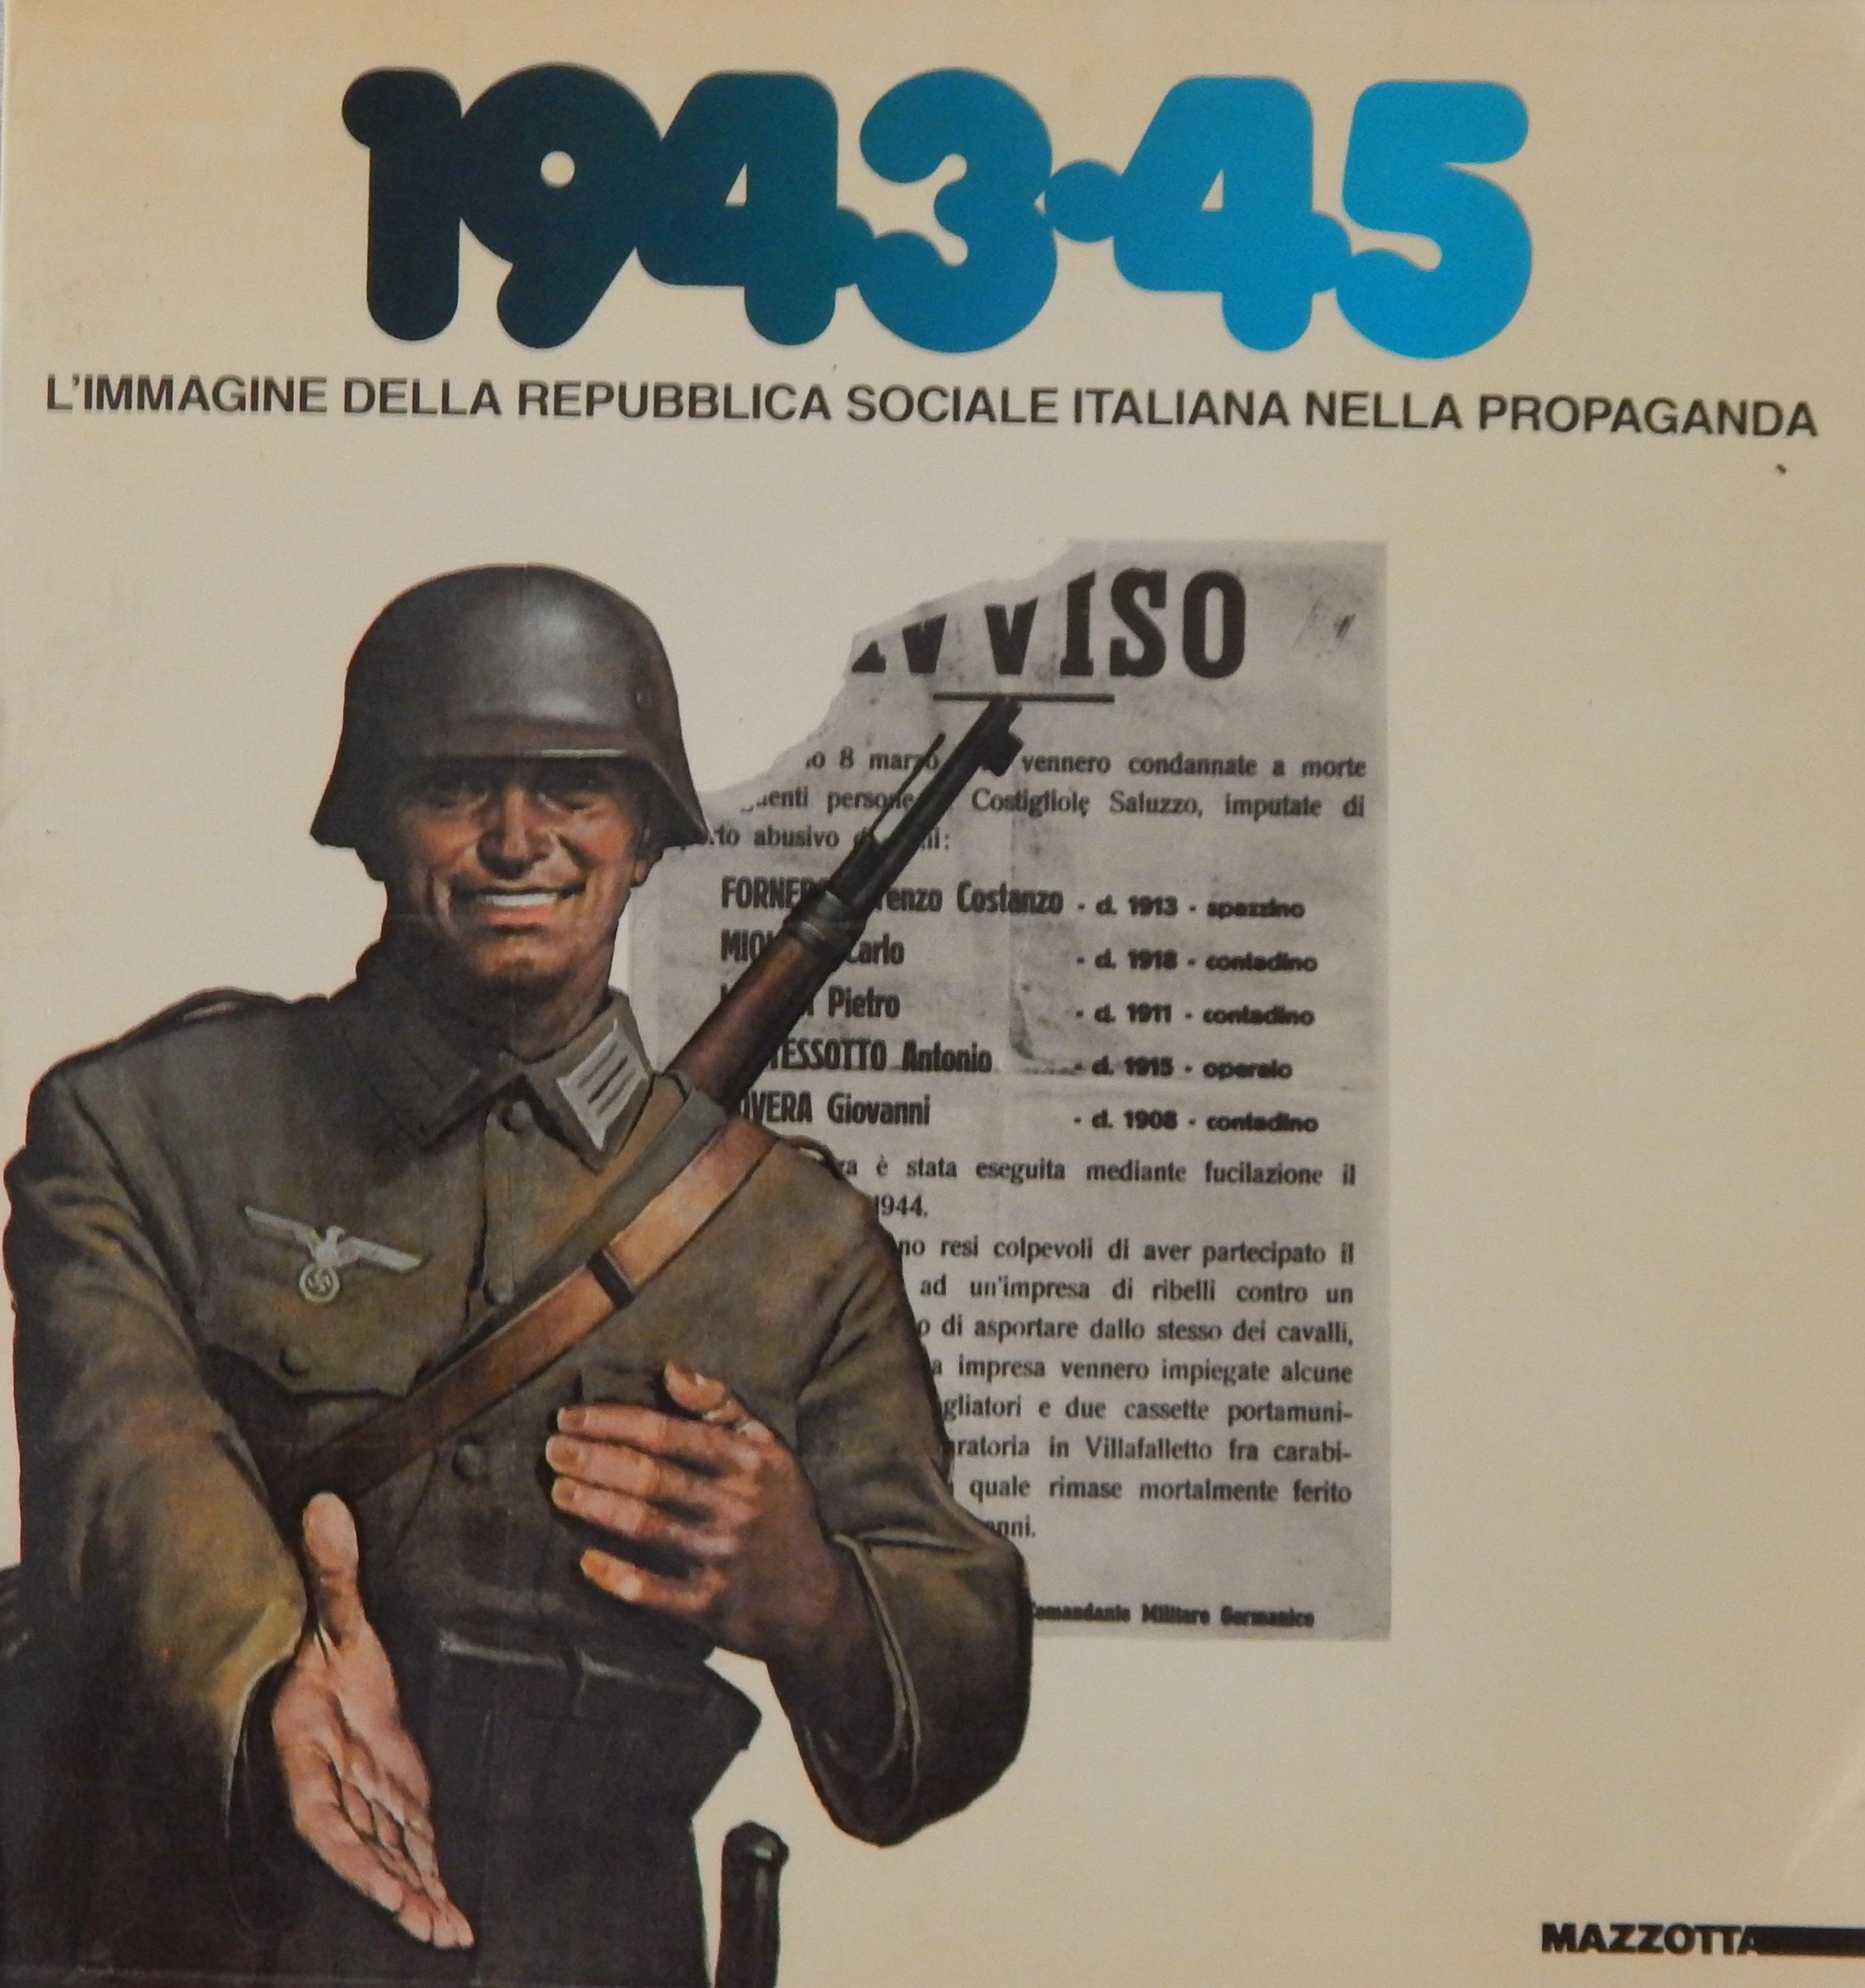 DECIMA FLOTTIGLIA M.A.S.: propaganda per la riscossa (XXIII parte) – Gianluca Padovan